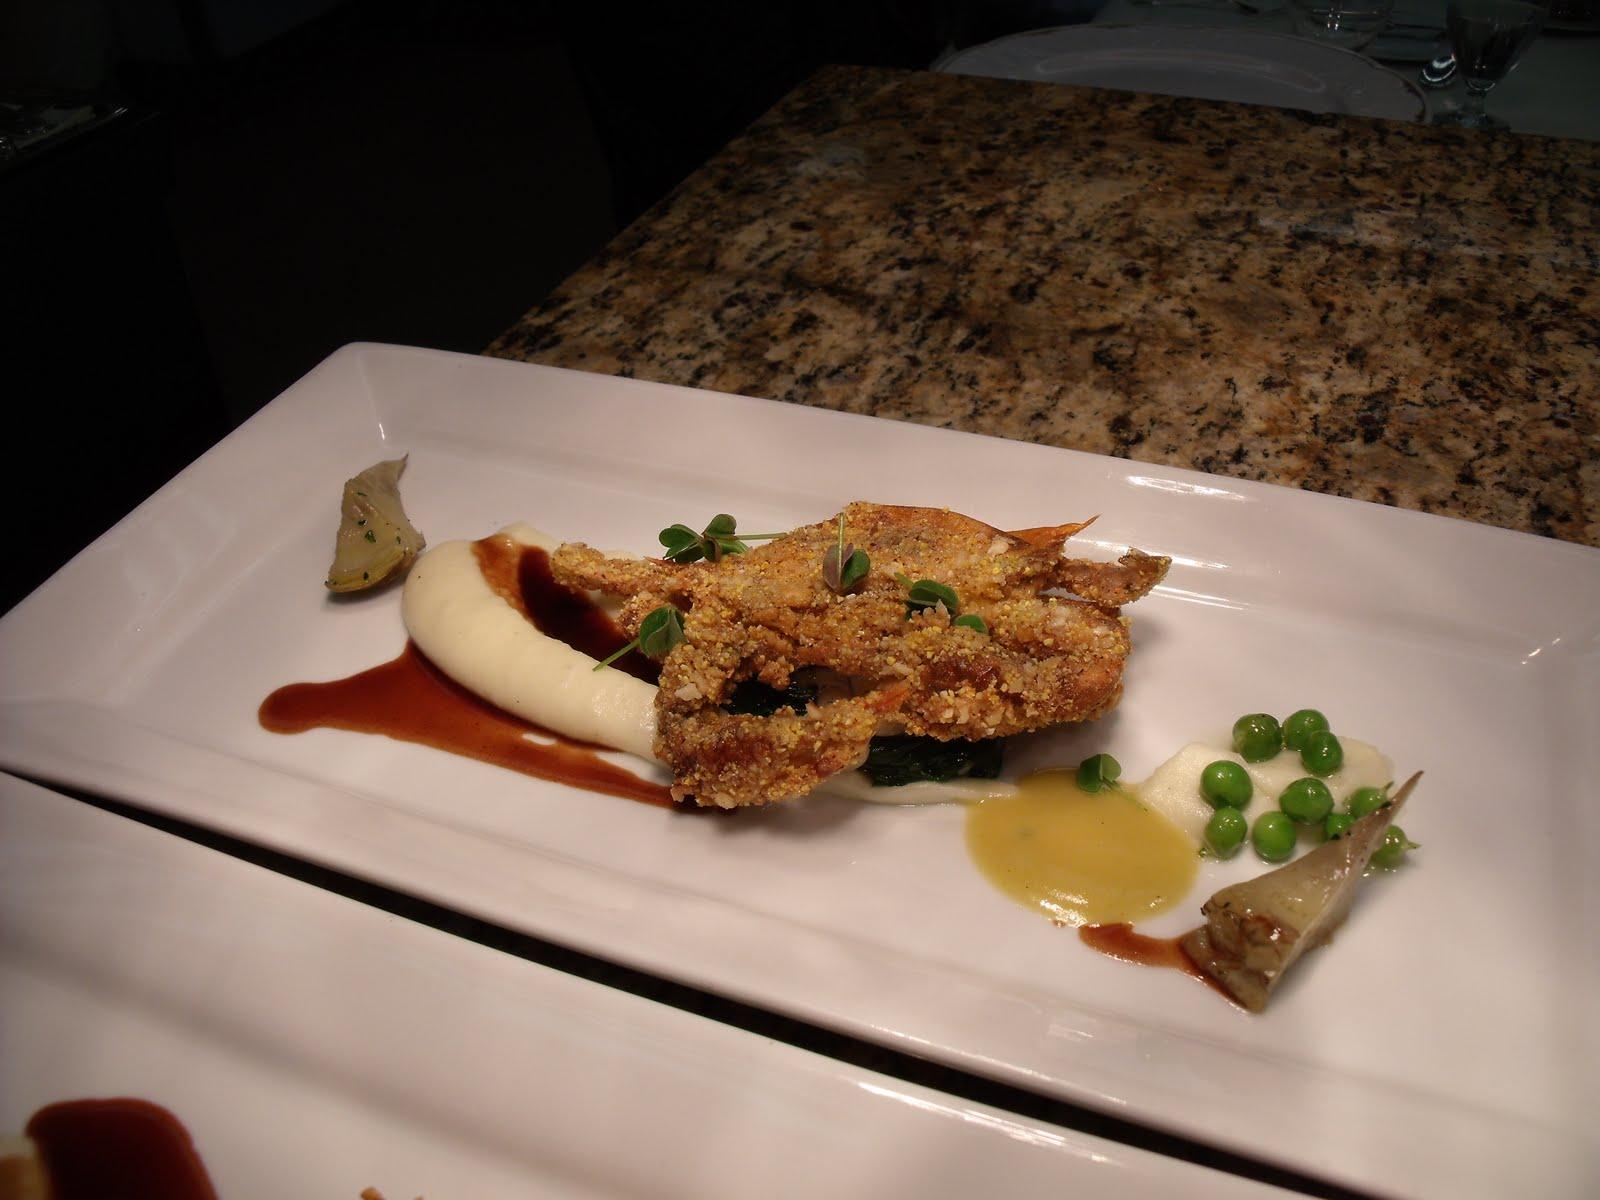 garlic-hazelnut-cornmeal crusted soft shell crab